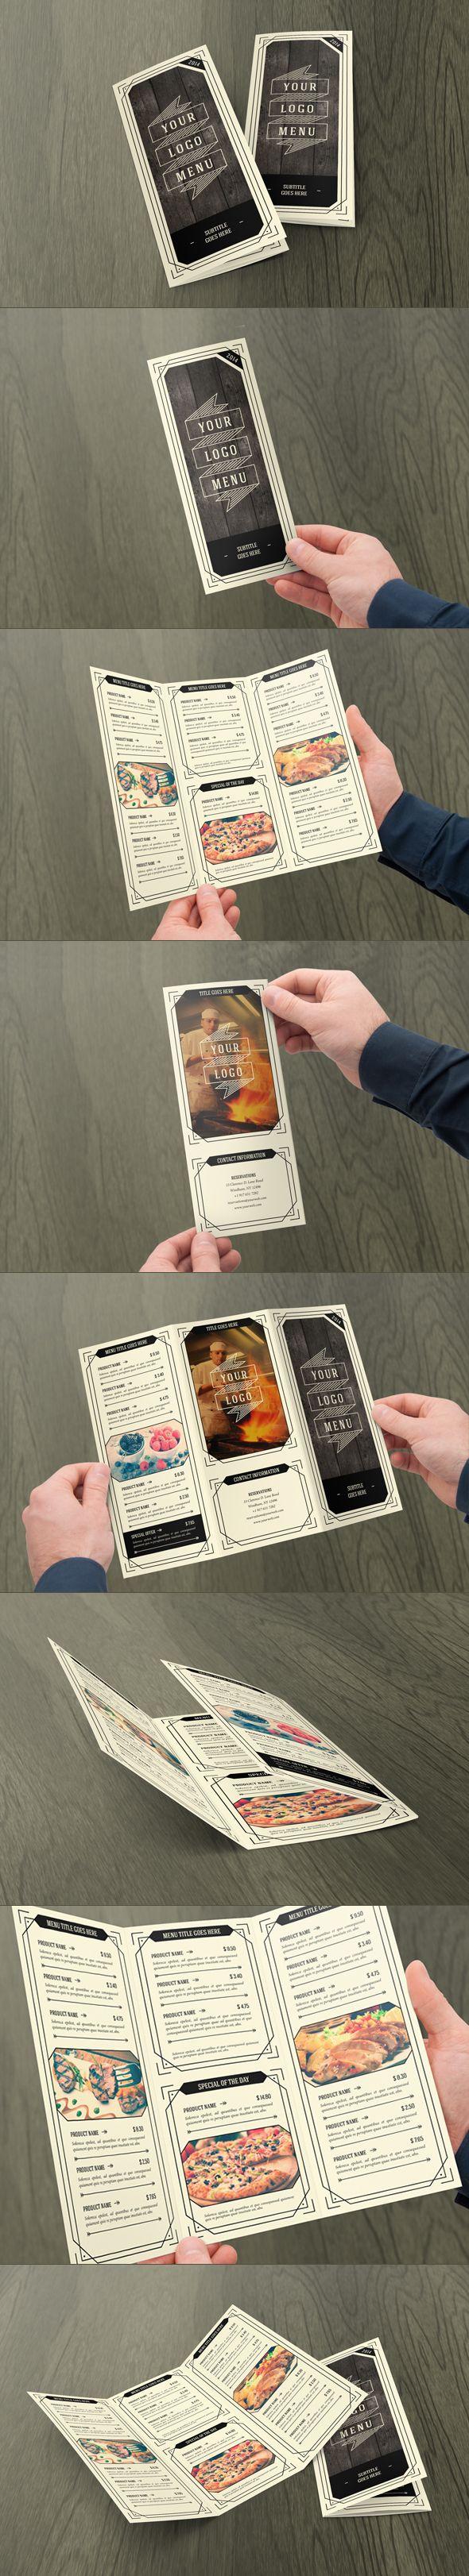 Retro Indie Food Menu. Download here: http://graphicriver.net/item/retro-indie-menu-trifold/7155587?ref=abradesign #design #trifold #menu